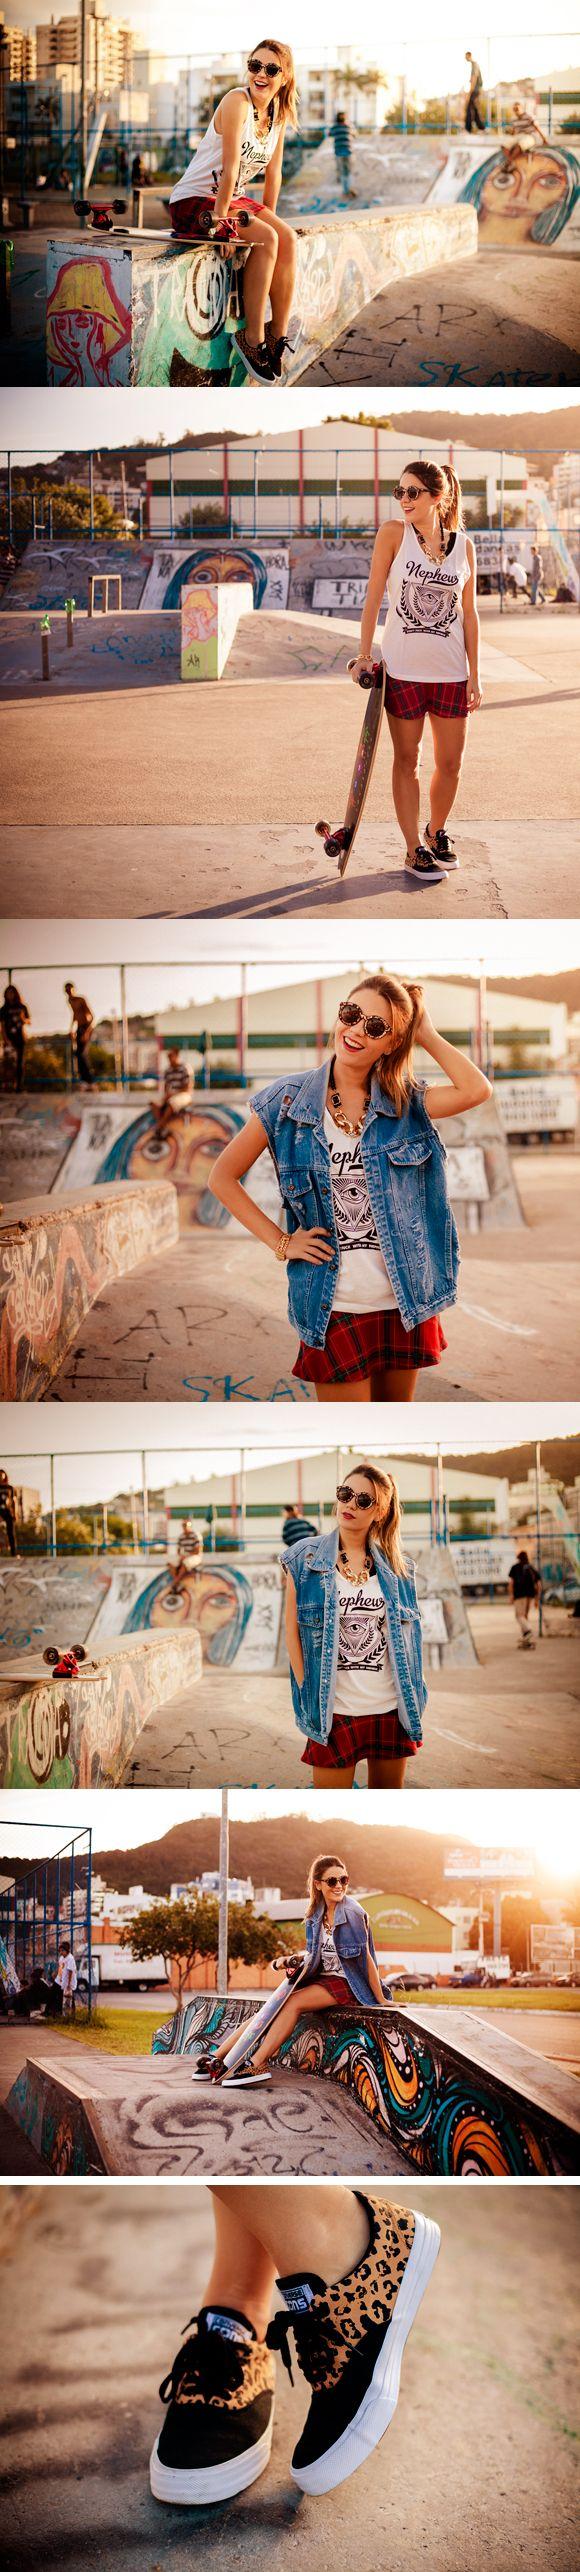 Editorial Skate Lovers por Fofochic- Muscletee nephew + Sunglasses ANIMAL + Saia Xadrez e Maxicolar >> SHOP NOW: www.modeoficial.com